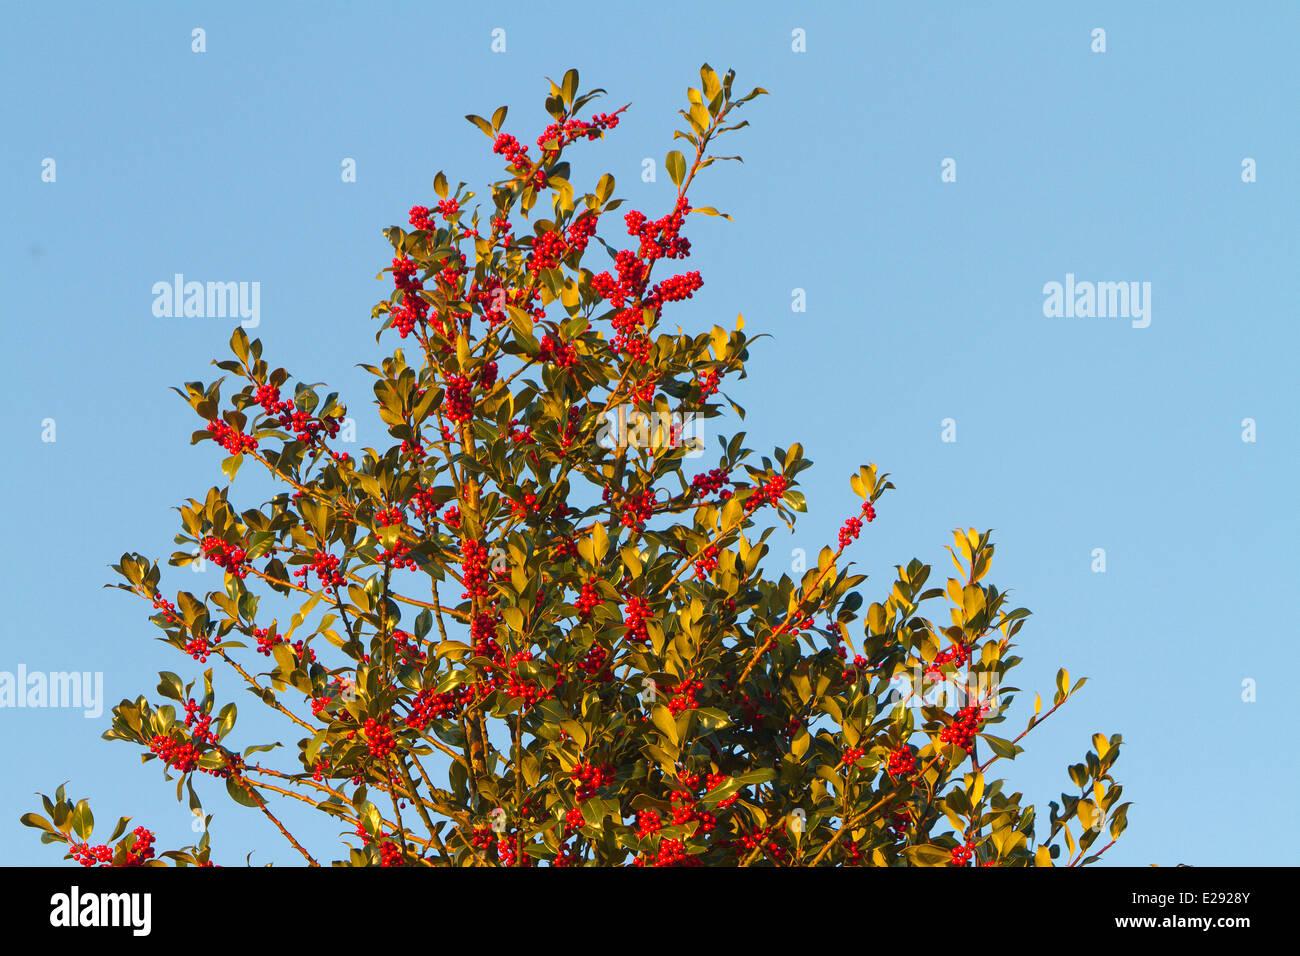 France, Haut Rhin, holly, or european holly (Ilex aquifolium), female tree with red fruits - Stock Image